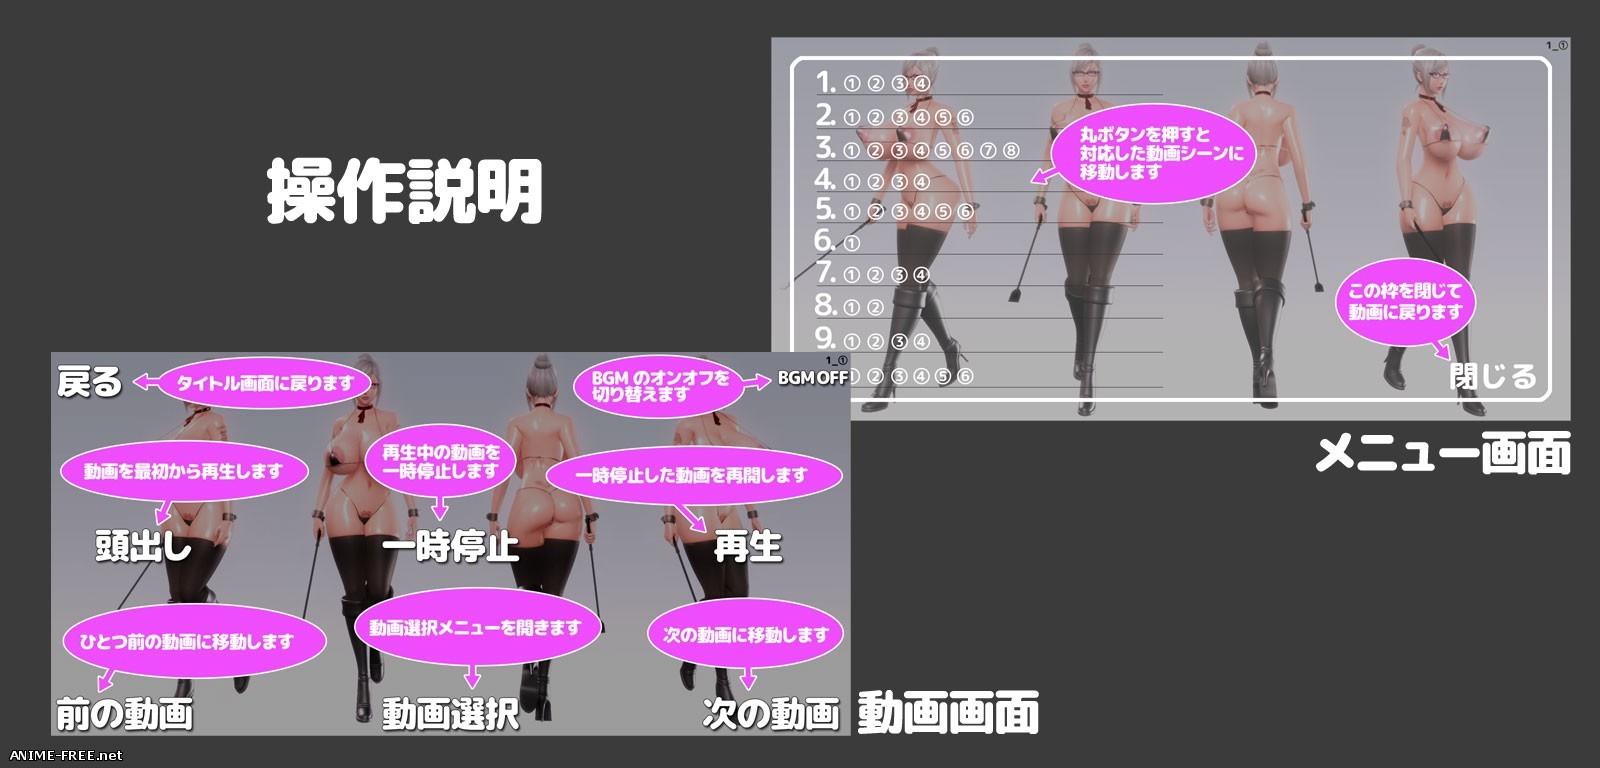 (Prison School) Omoni kako deta o tsukai mawashite tsukutta kessaku doga-shu A [2016] [Cen] [Animation, 3D, Flash] [JAP] H-Game